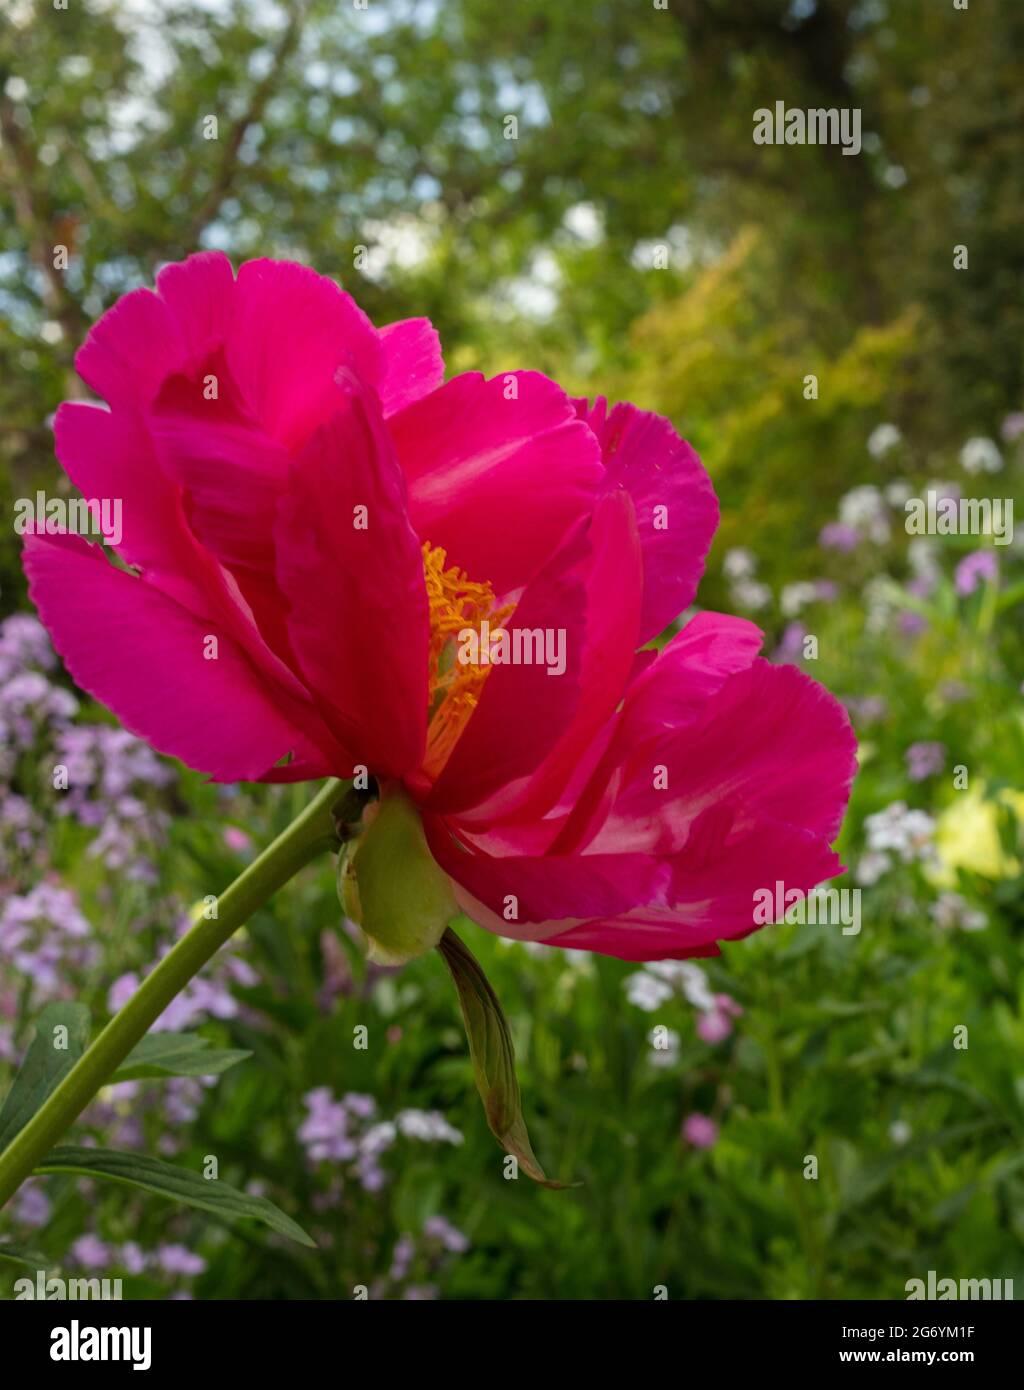 Paeonia 'Scarlet O'Hara, peony 'Scarlet O'Hara' bloom in close-up Stock Photo